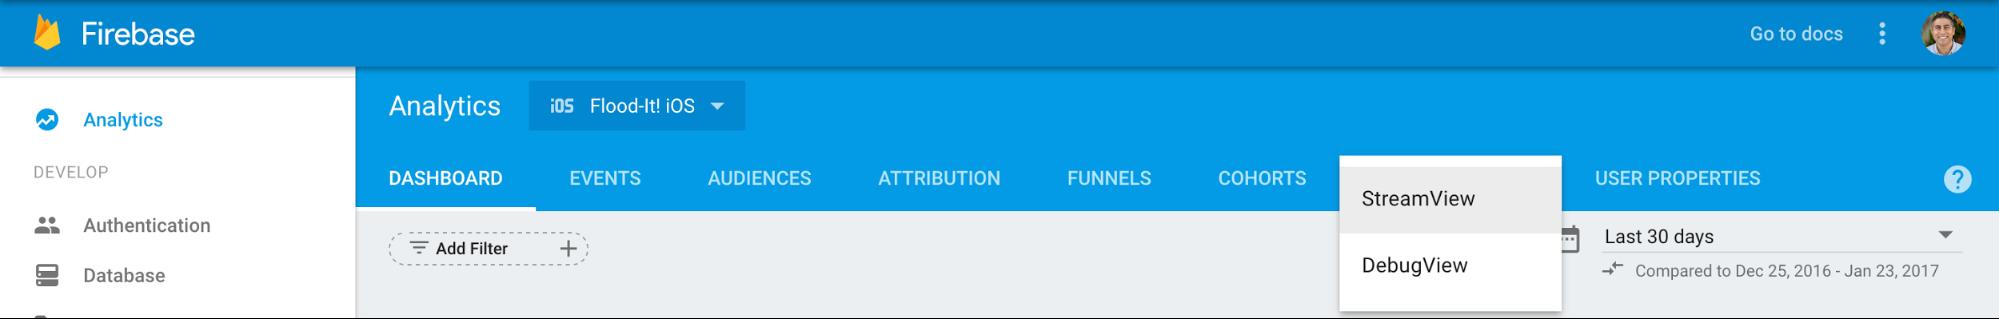 Google 애널리틱스의 상단 탐색 메뉴에서 StreamView 옆의 화살표를 클릭하고 DebugView를 선택하여 DebugView로 이동